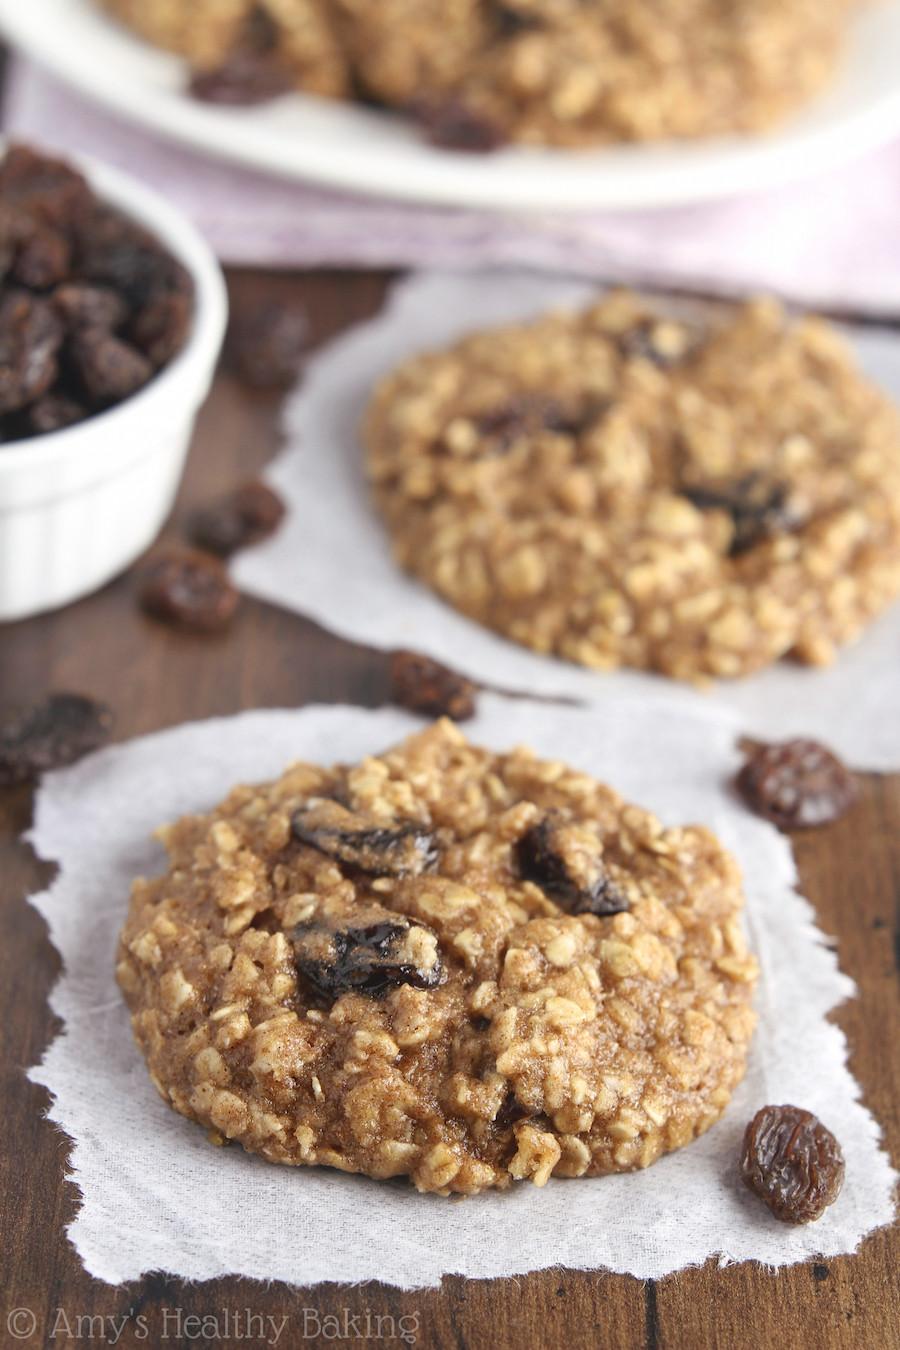 Ultimate Oatmeal Raisin Cookies  The Ultimate Healthy Soft & Chewy Oatmeal Raisin Cookies